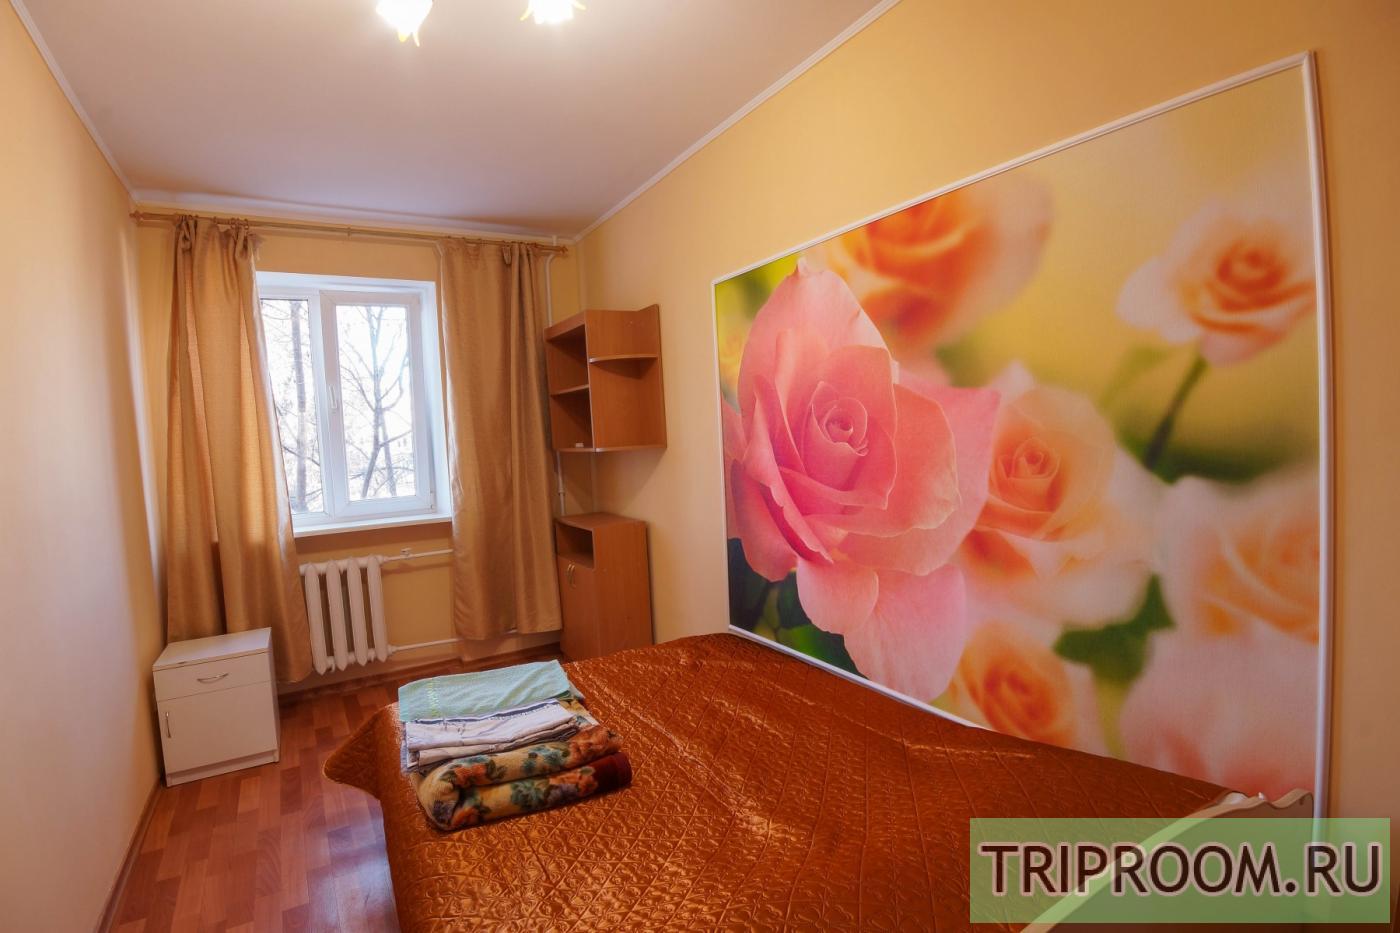 3-комнатная квартира посуточно (вариант № 19470), ул. Спера улица, фото № 1